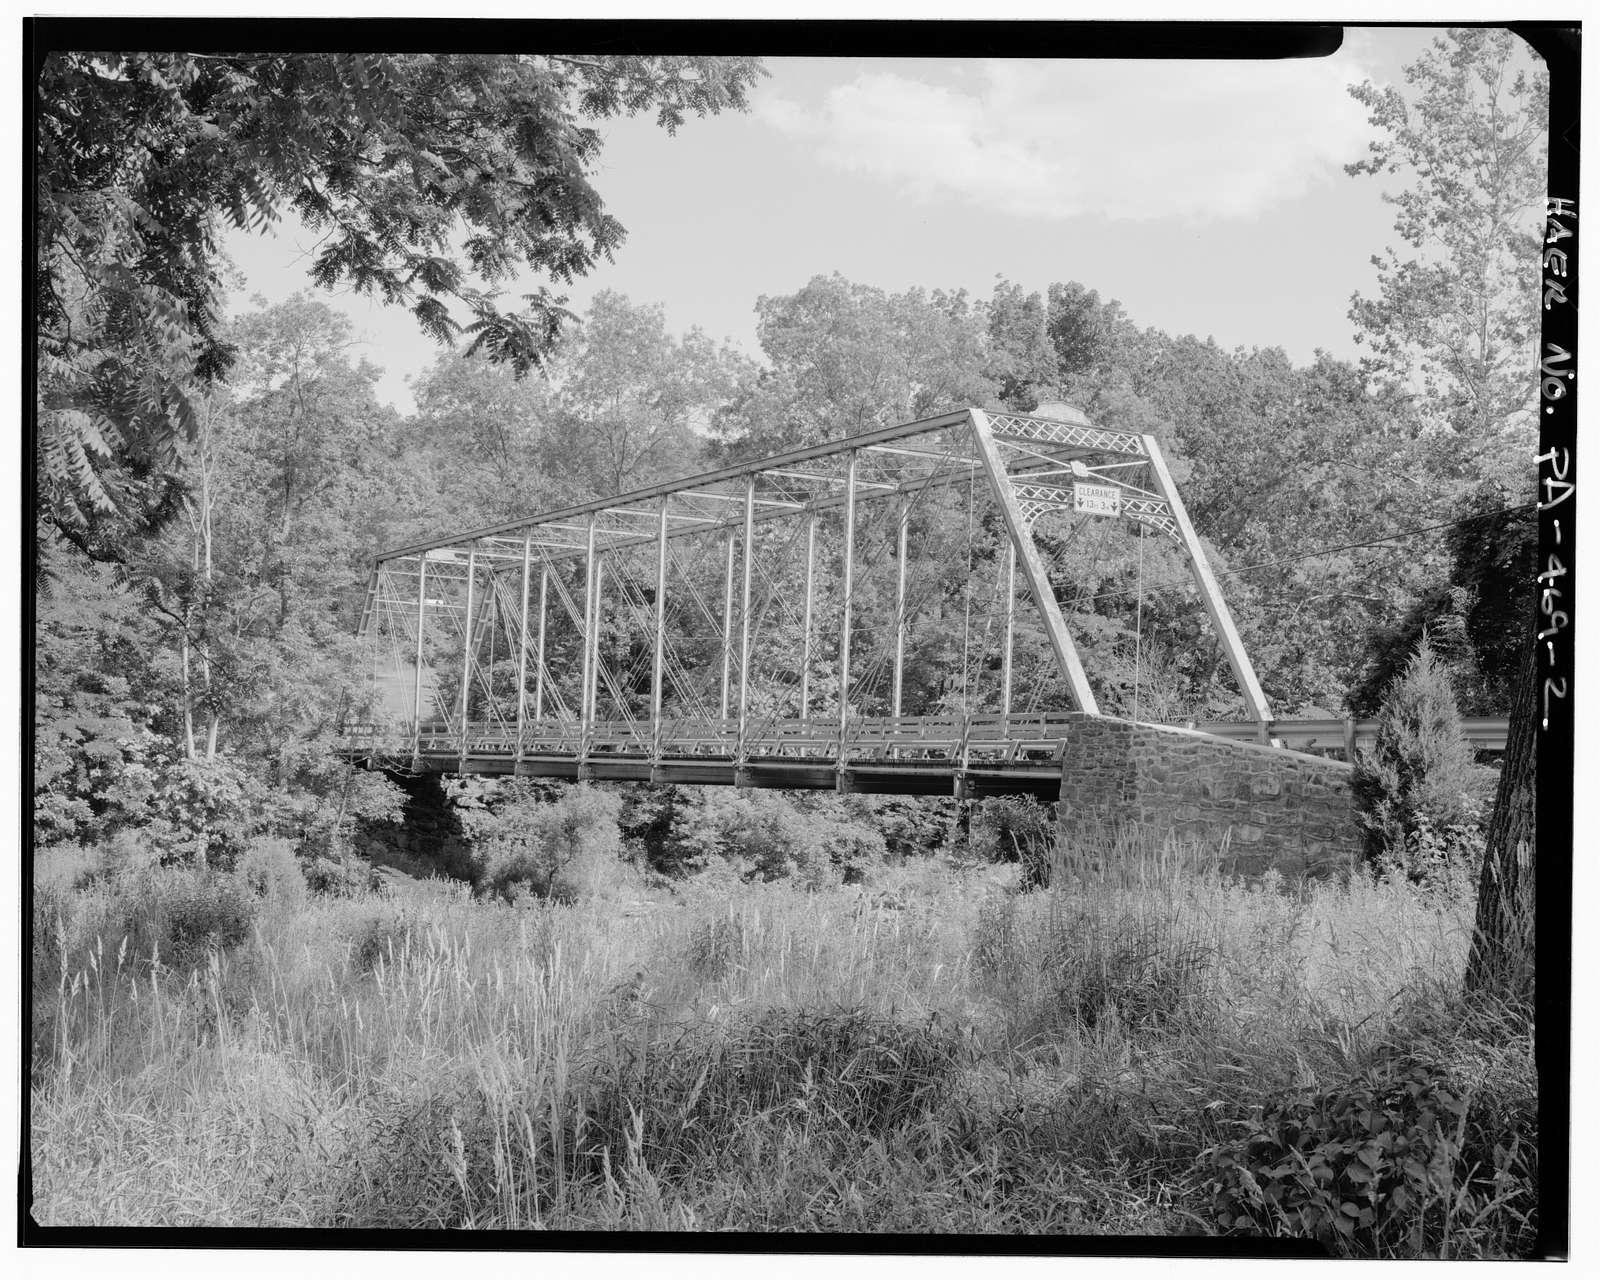 Kralltown Road Bridge, Spanning Bermudian Creek at Kralltown Road (State Route 4017), Kralltown, York County, PA